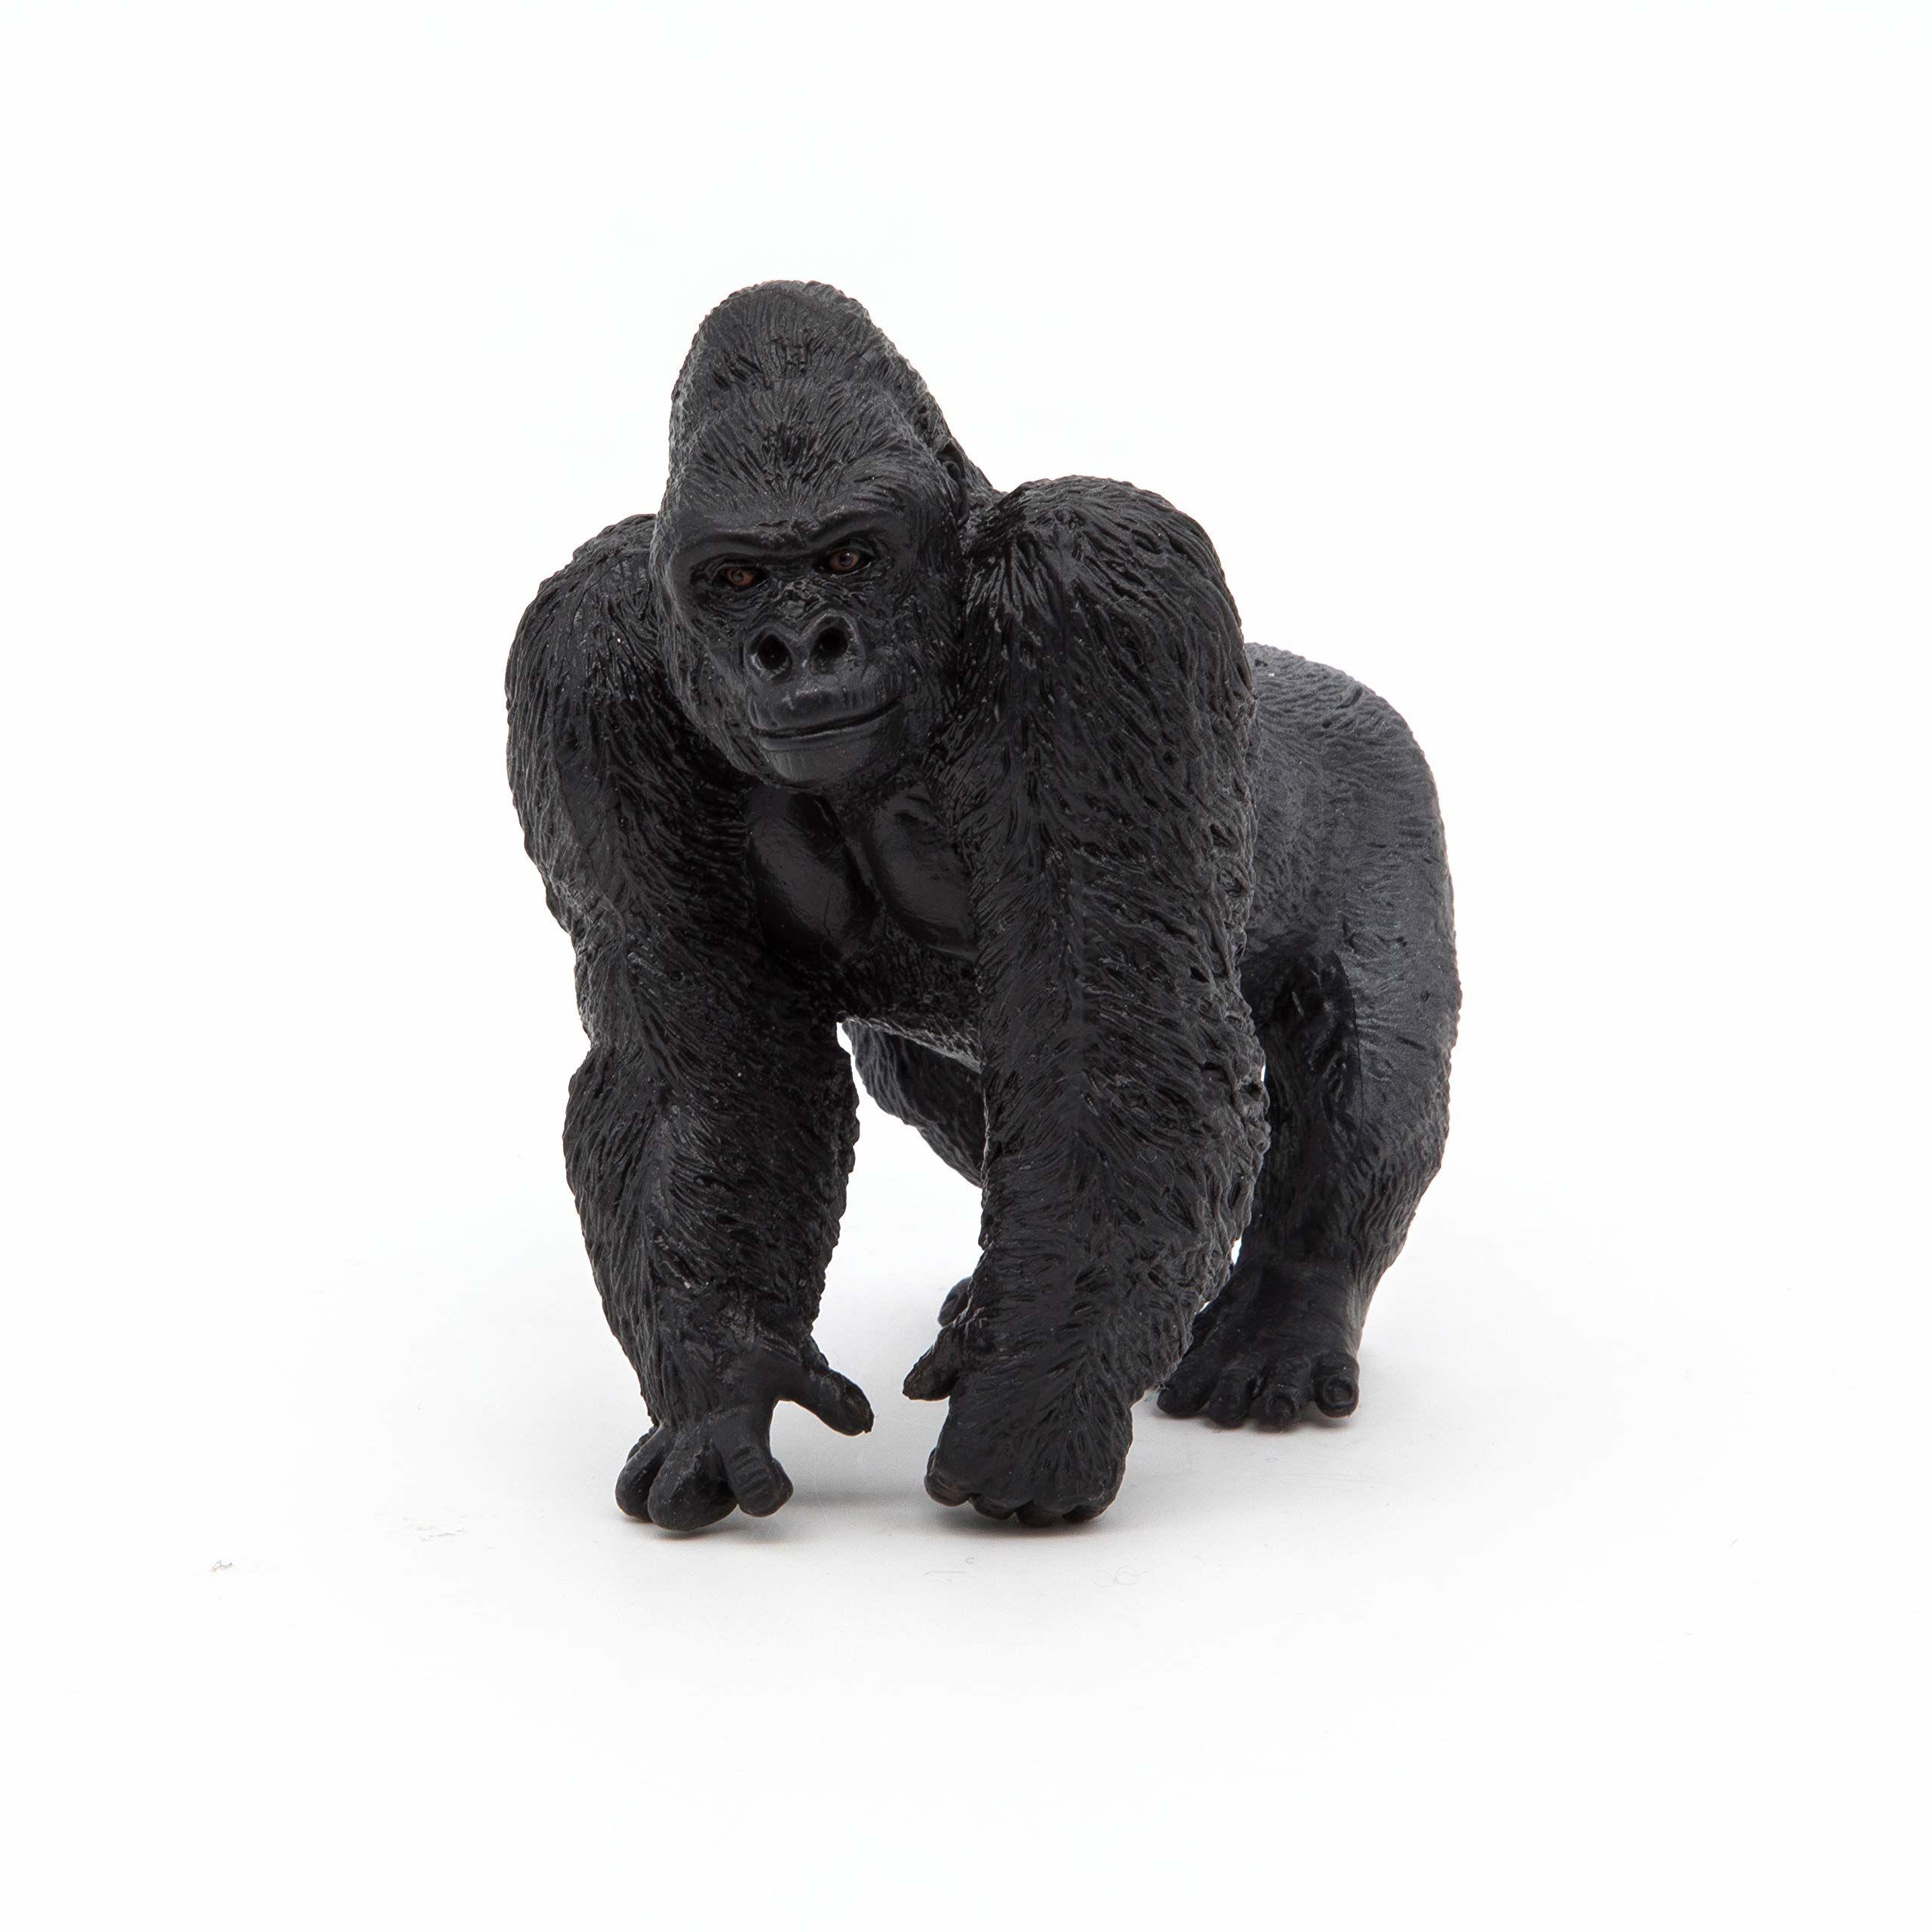 Papo 50034 -figurka goryla